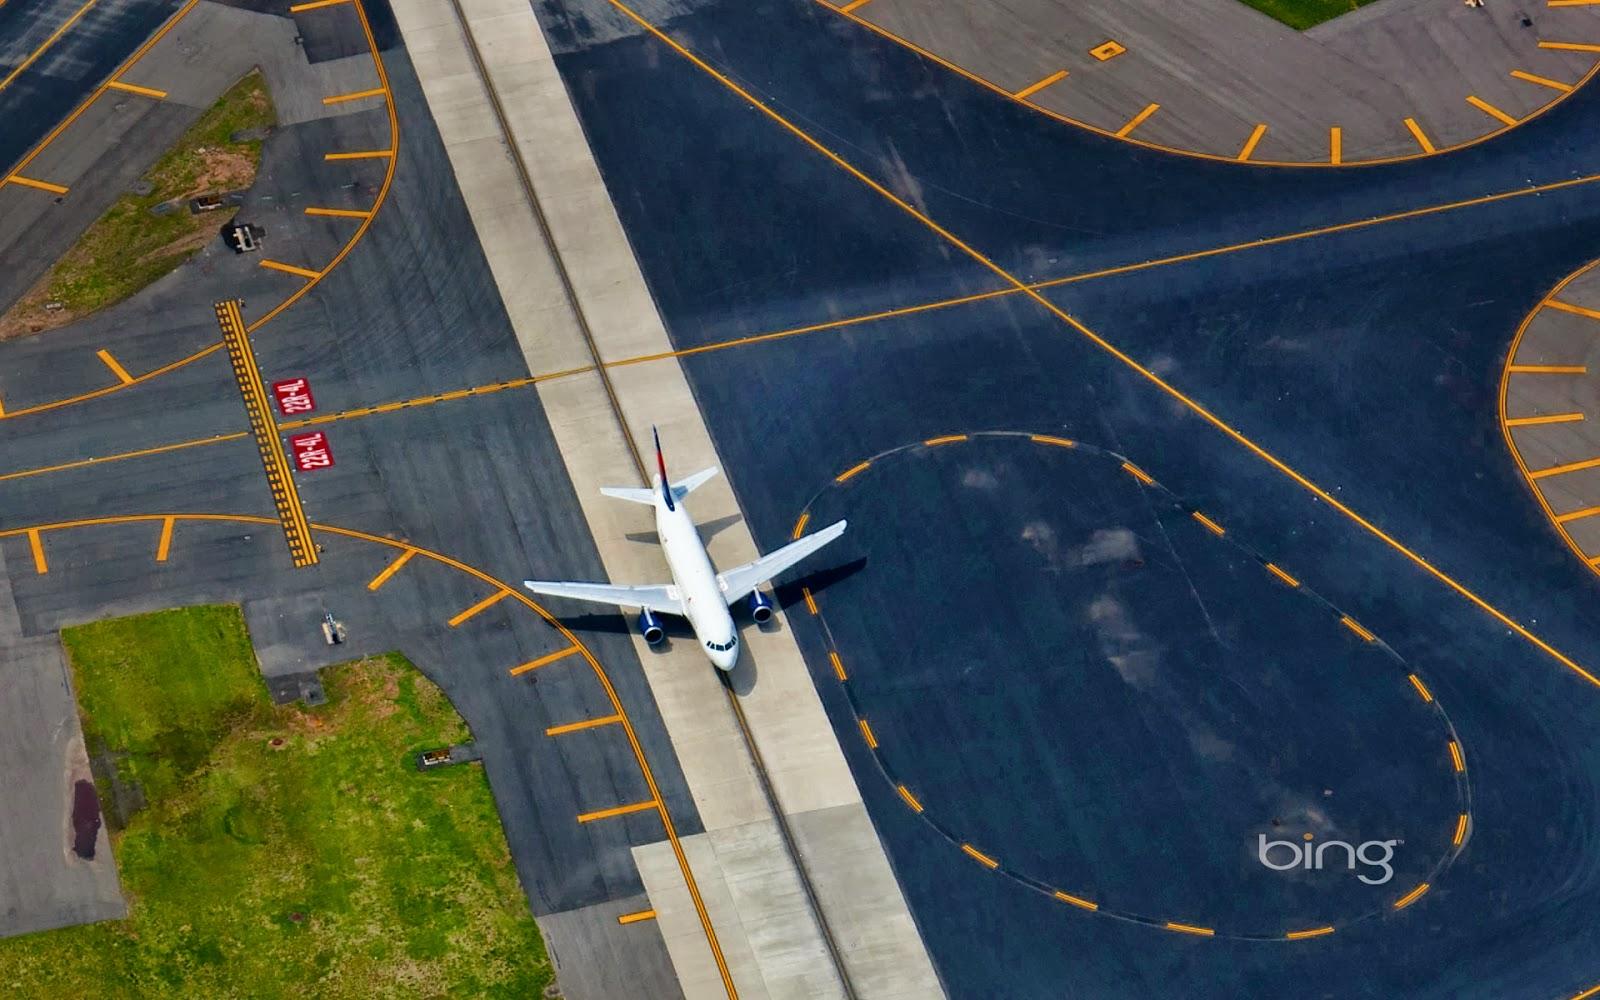 Newark Liberty International Airport, New